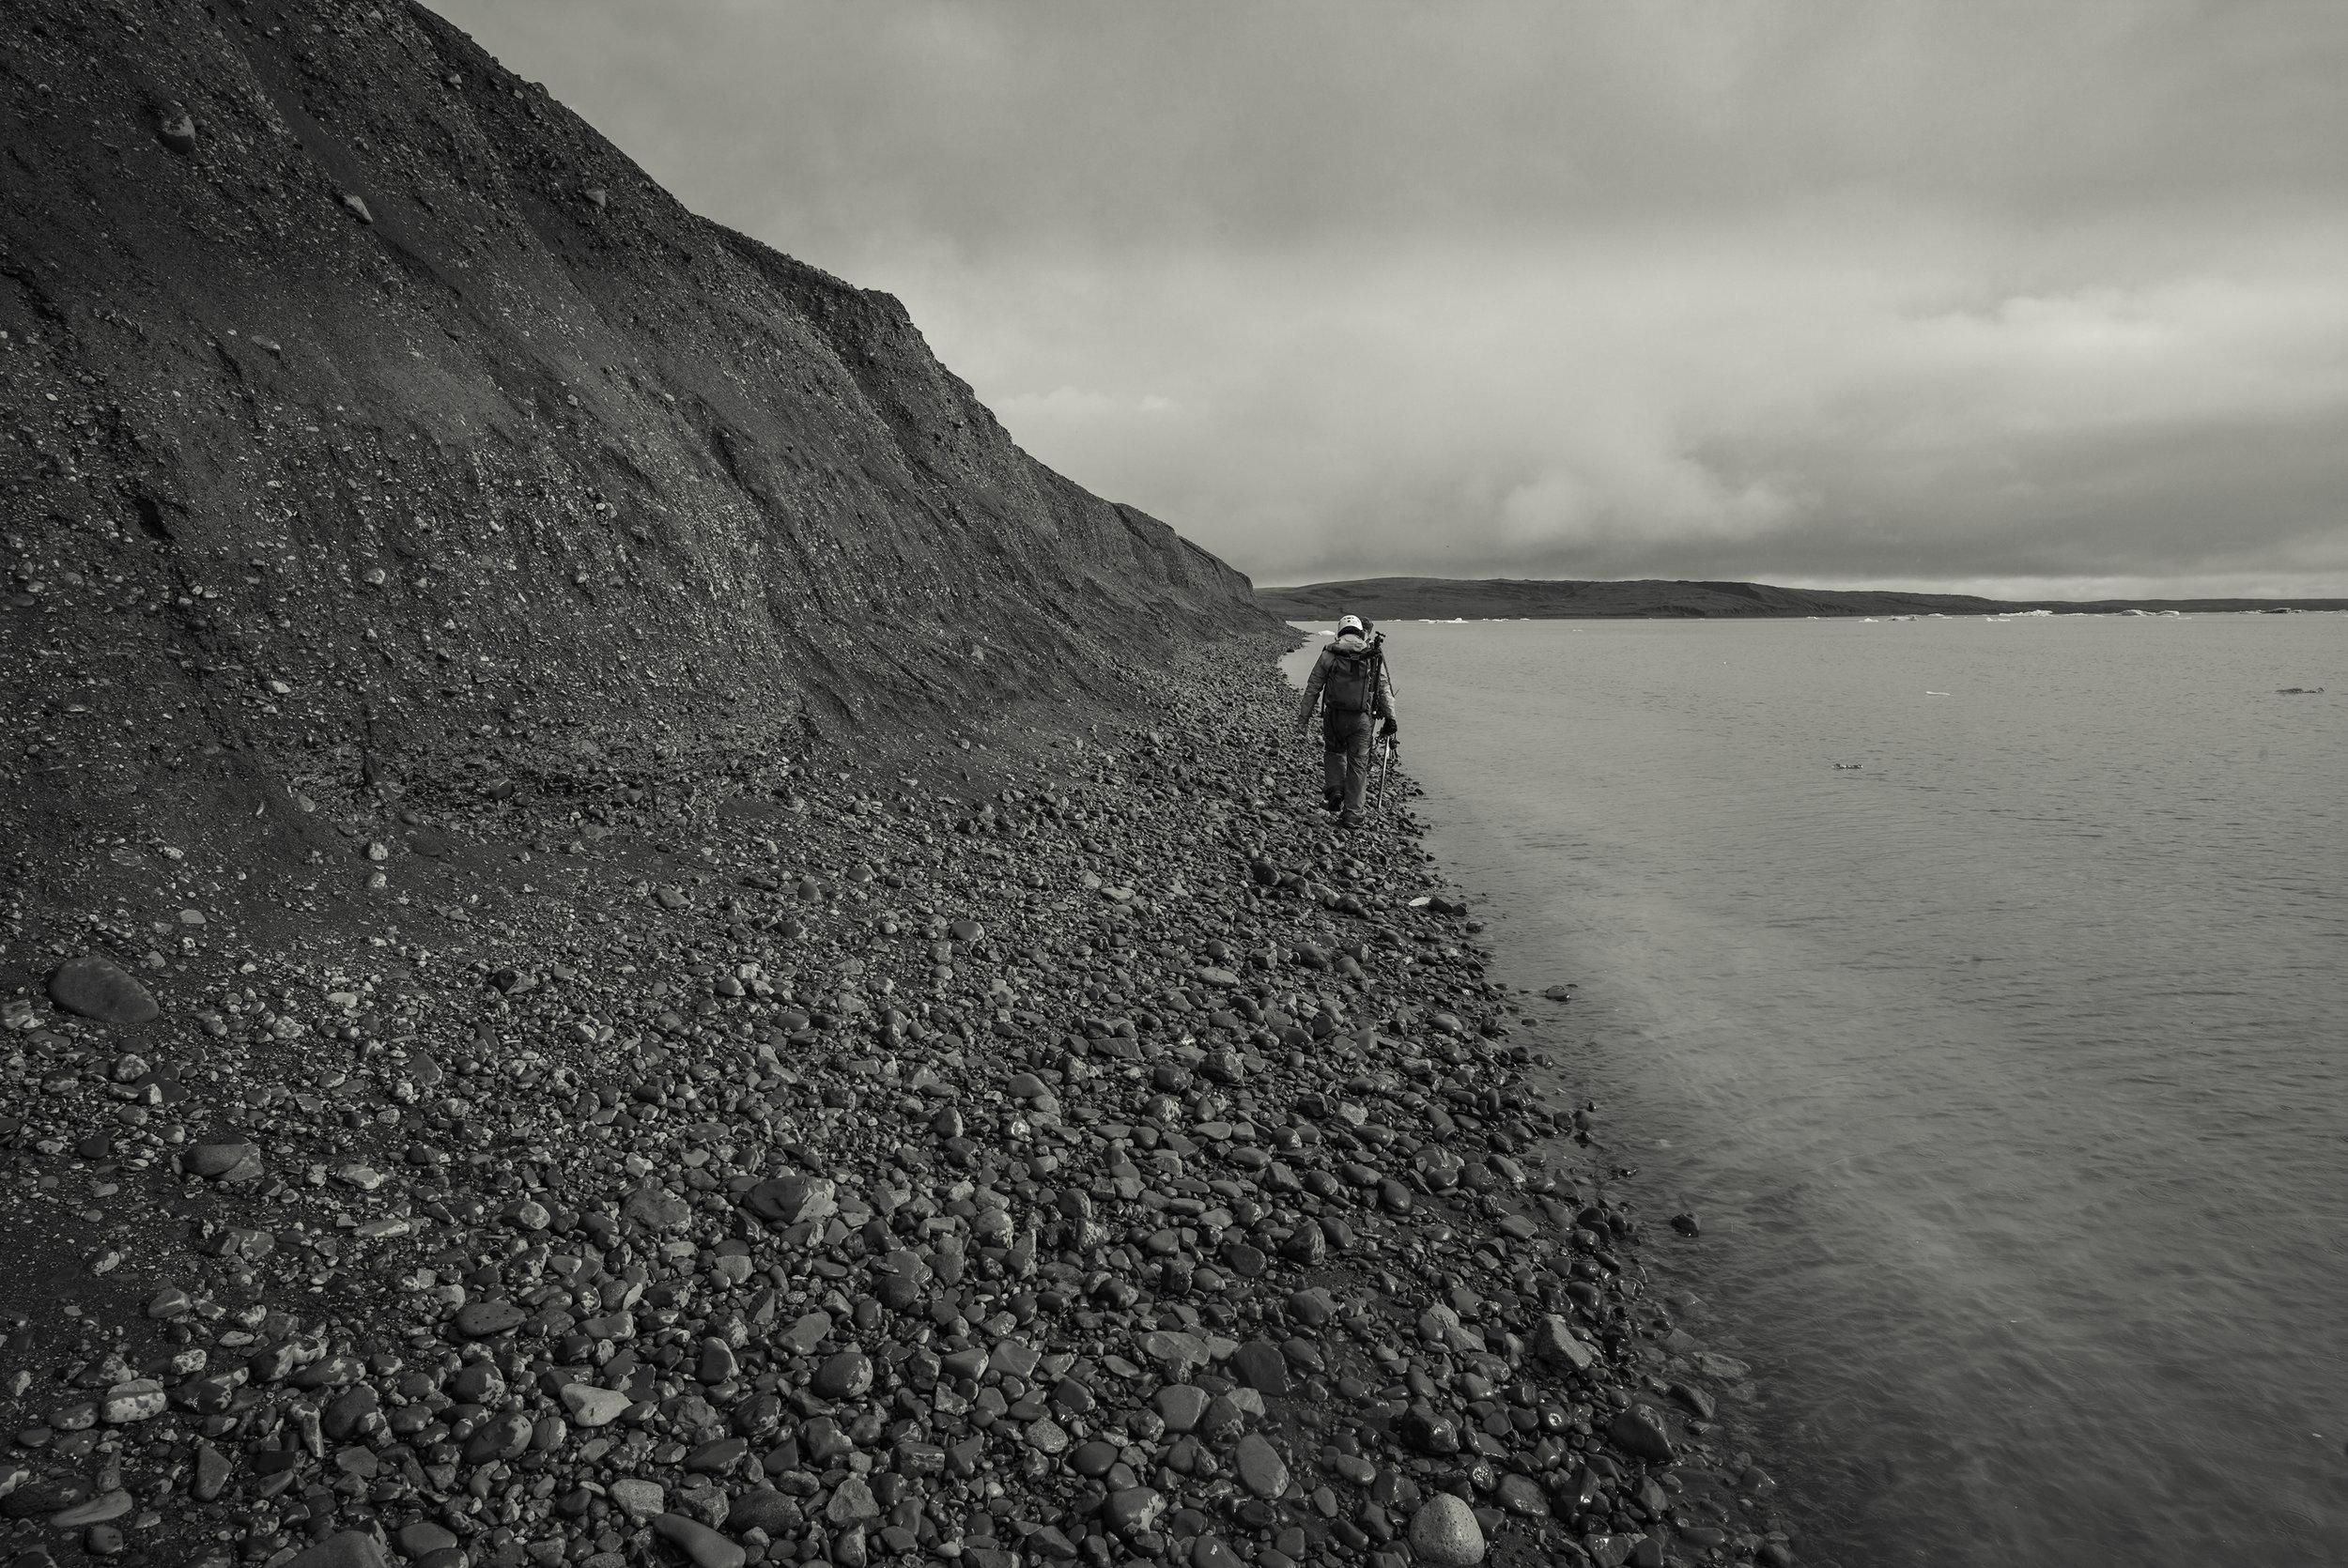 The moraine of silt and rocks left by the retreating glacier and the rocky beach next to Jölkúsarlón.